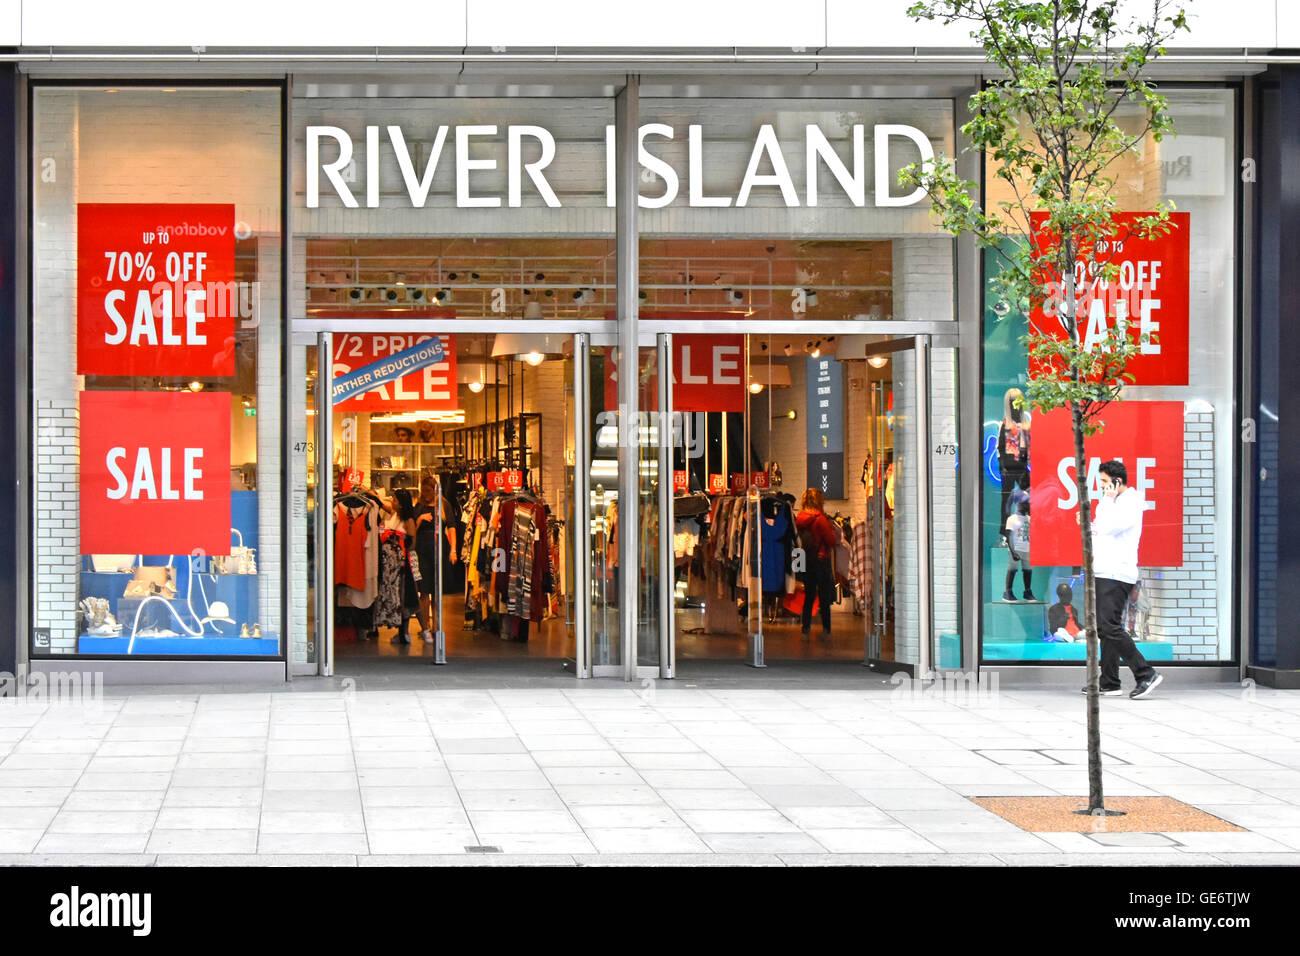 River Island Shop Oxford